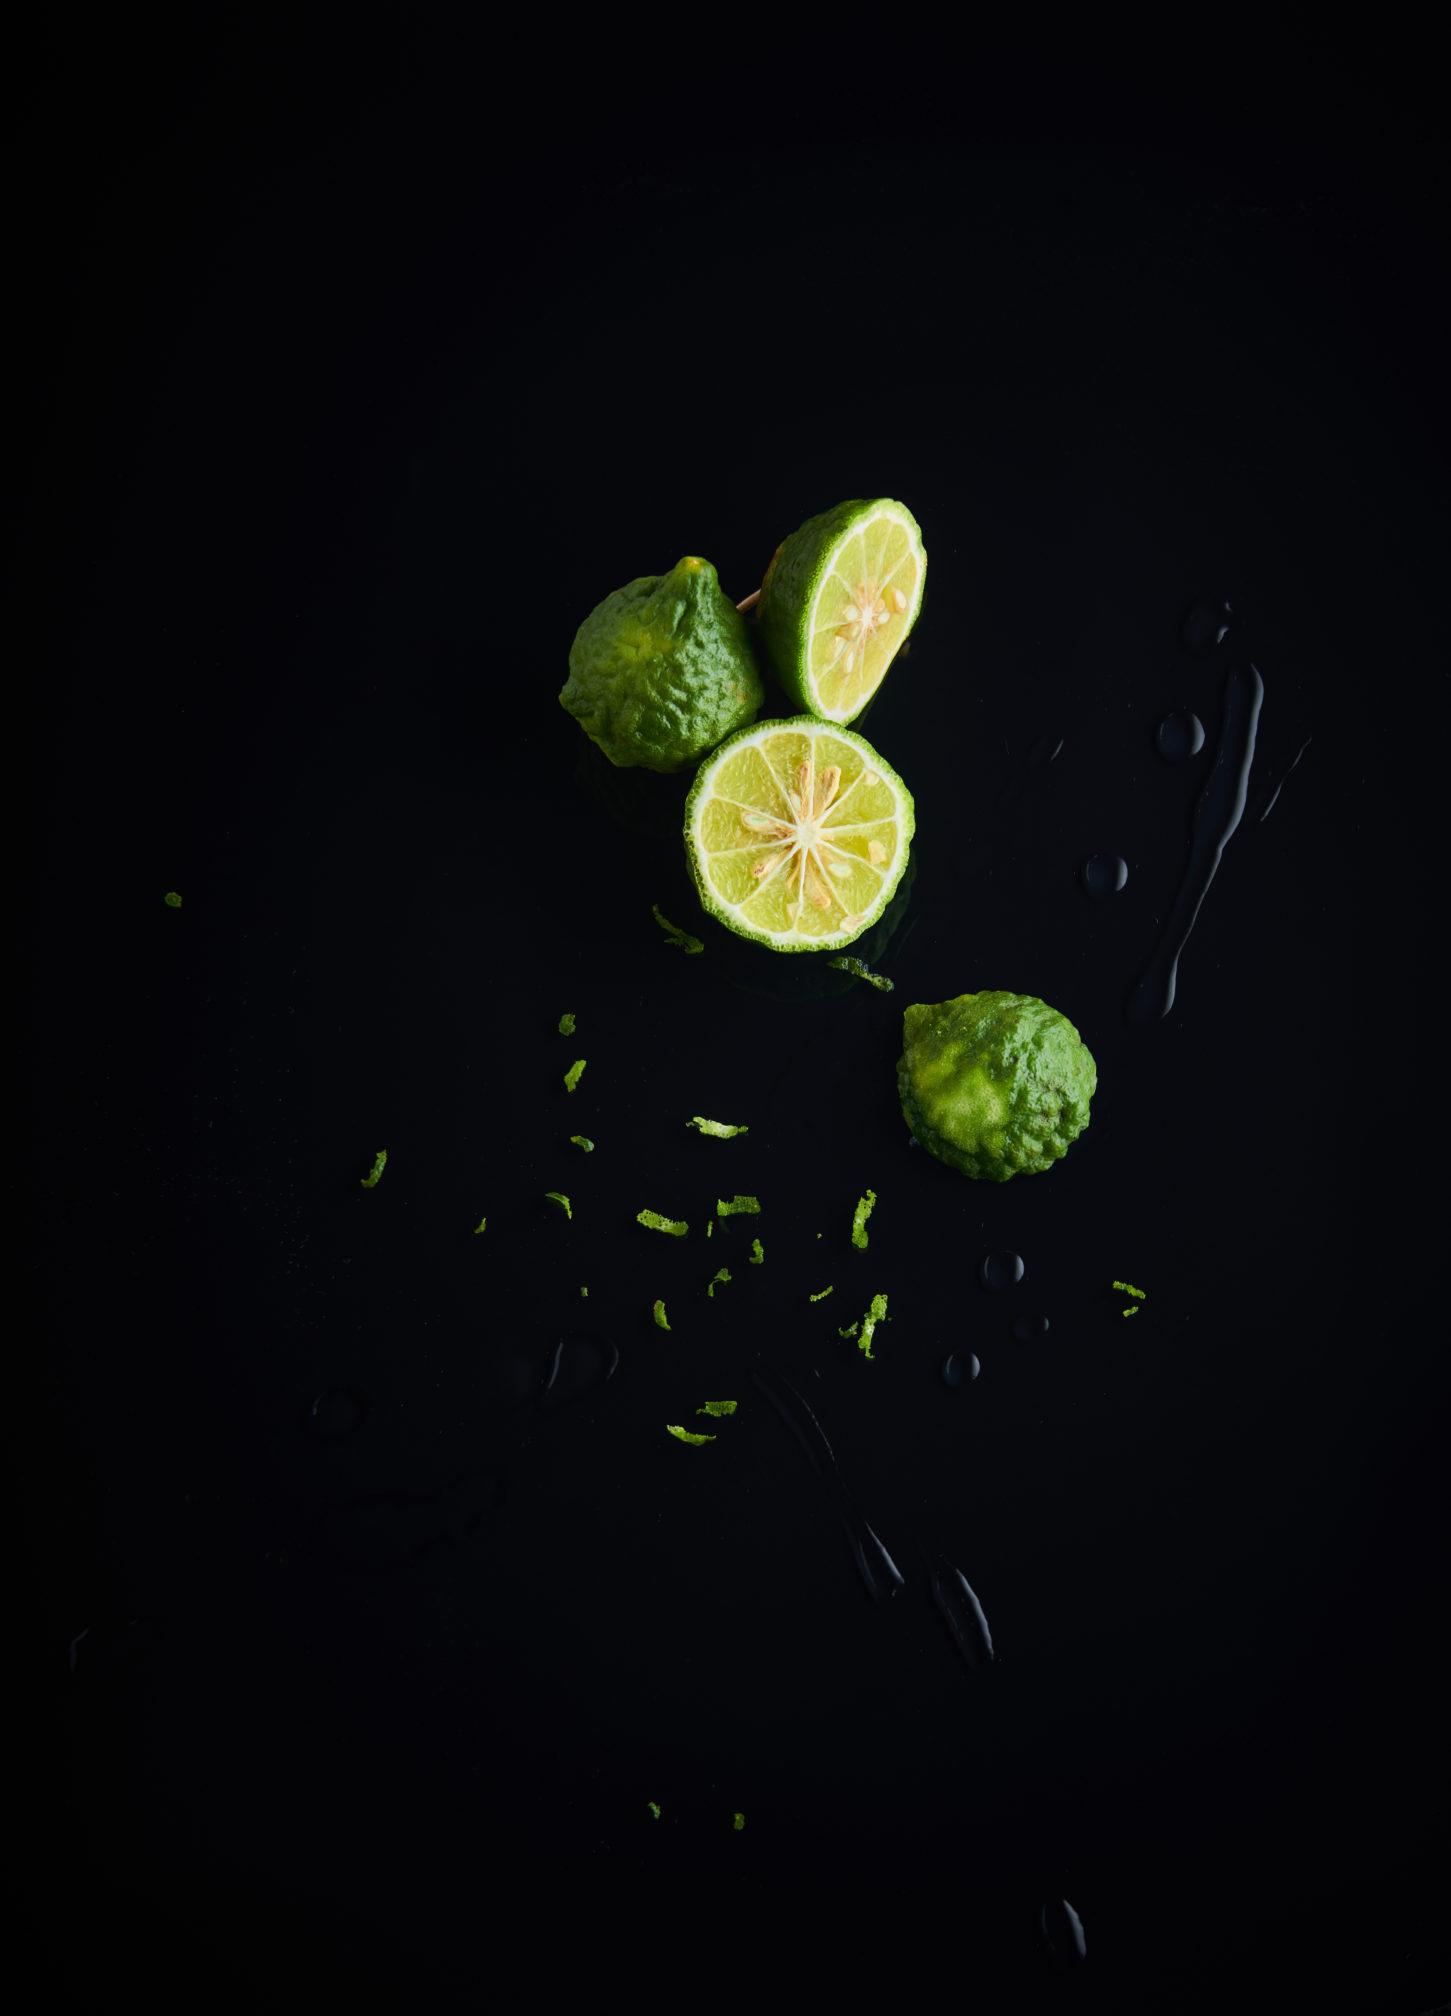 capexo-lilot-fruits-exotique-combava-malaisie-indonesie